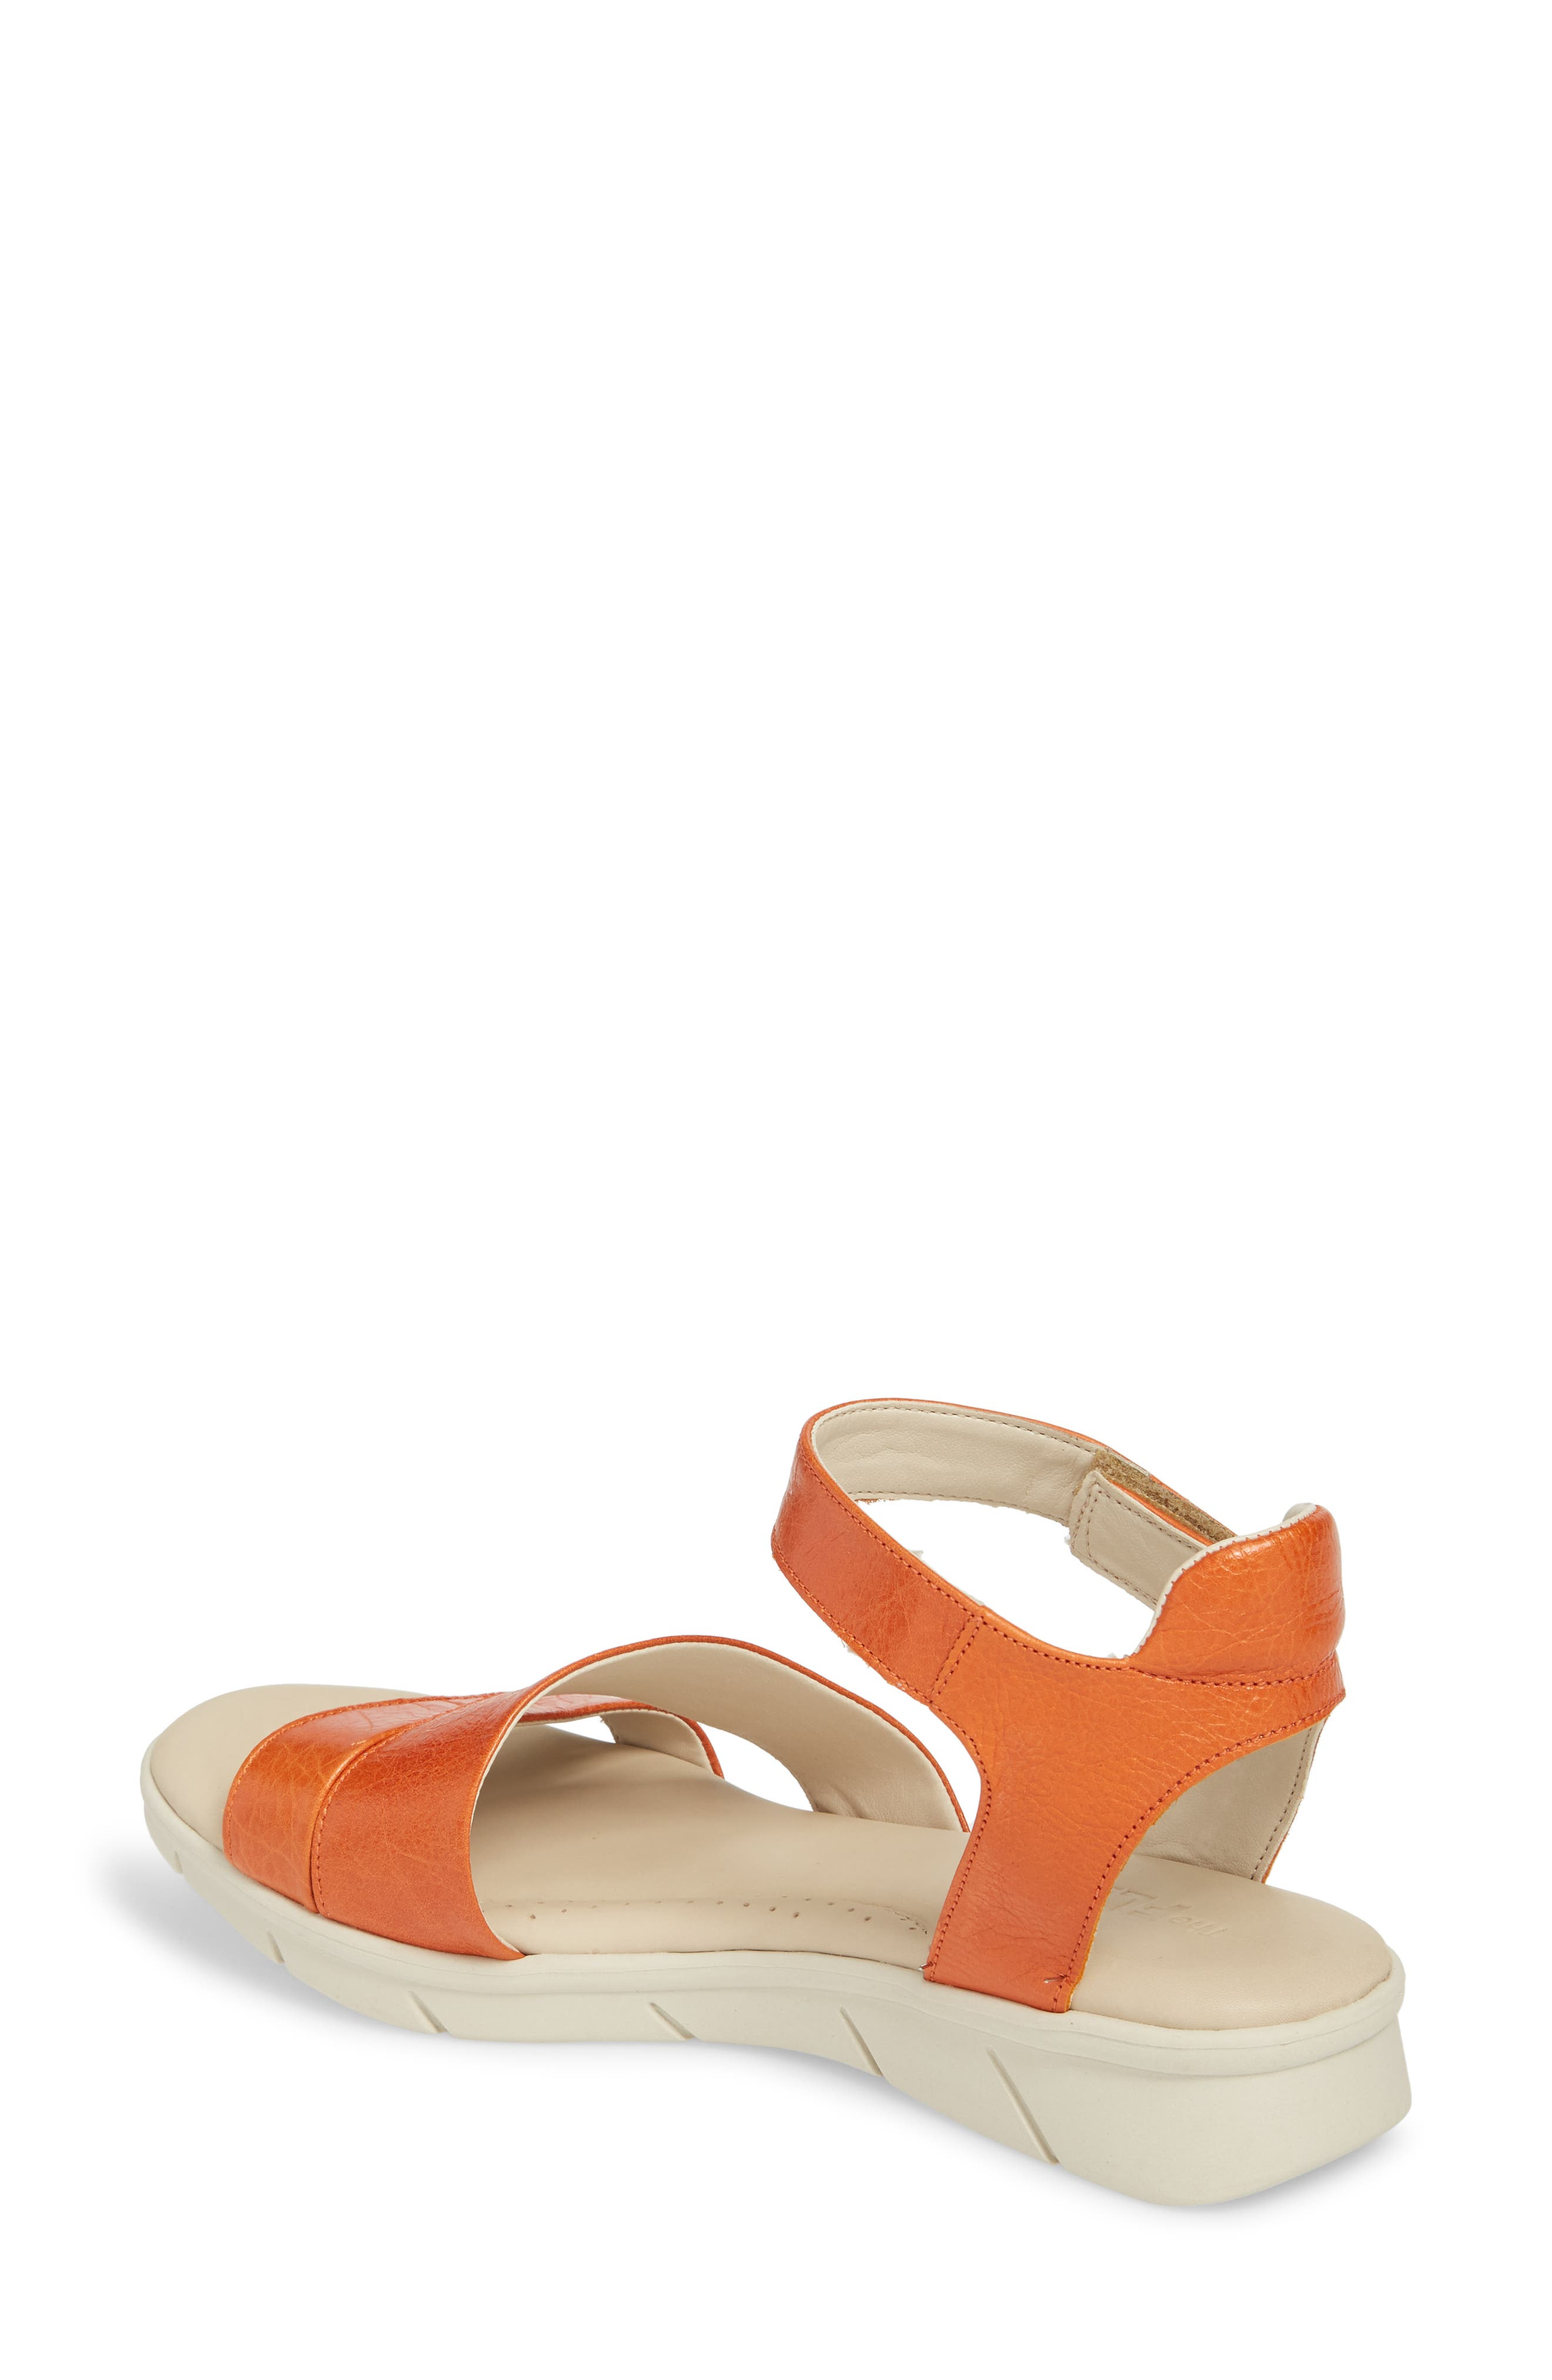 Crossover Ankle Strap Sandal,                             Alternate thumbnail 2, color,                             Mandarin Leather